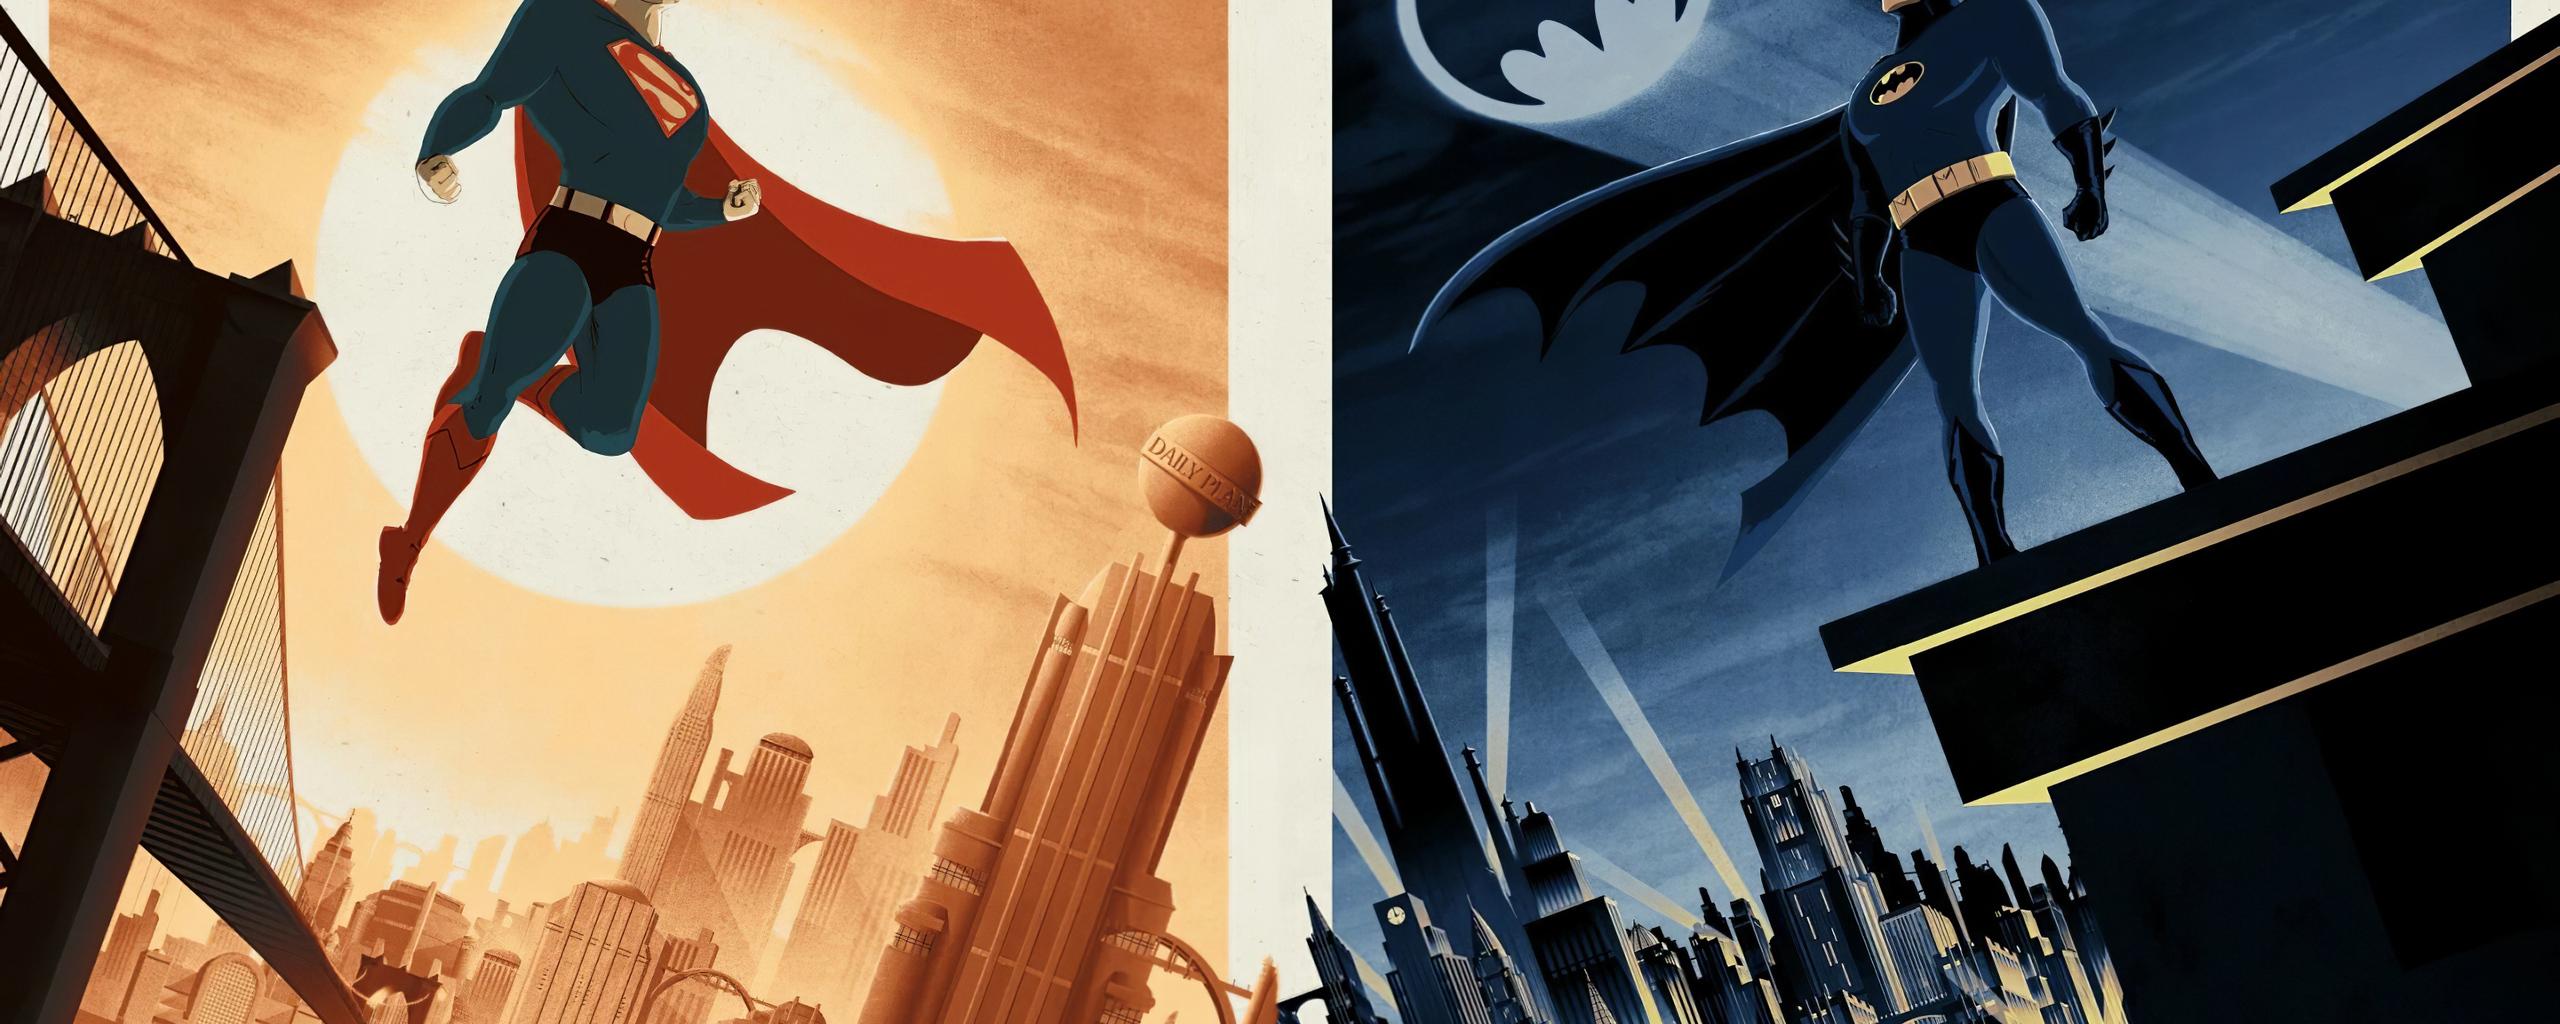 batman-and-super-man-artwork-cu.jpg